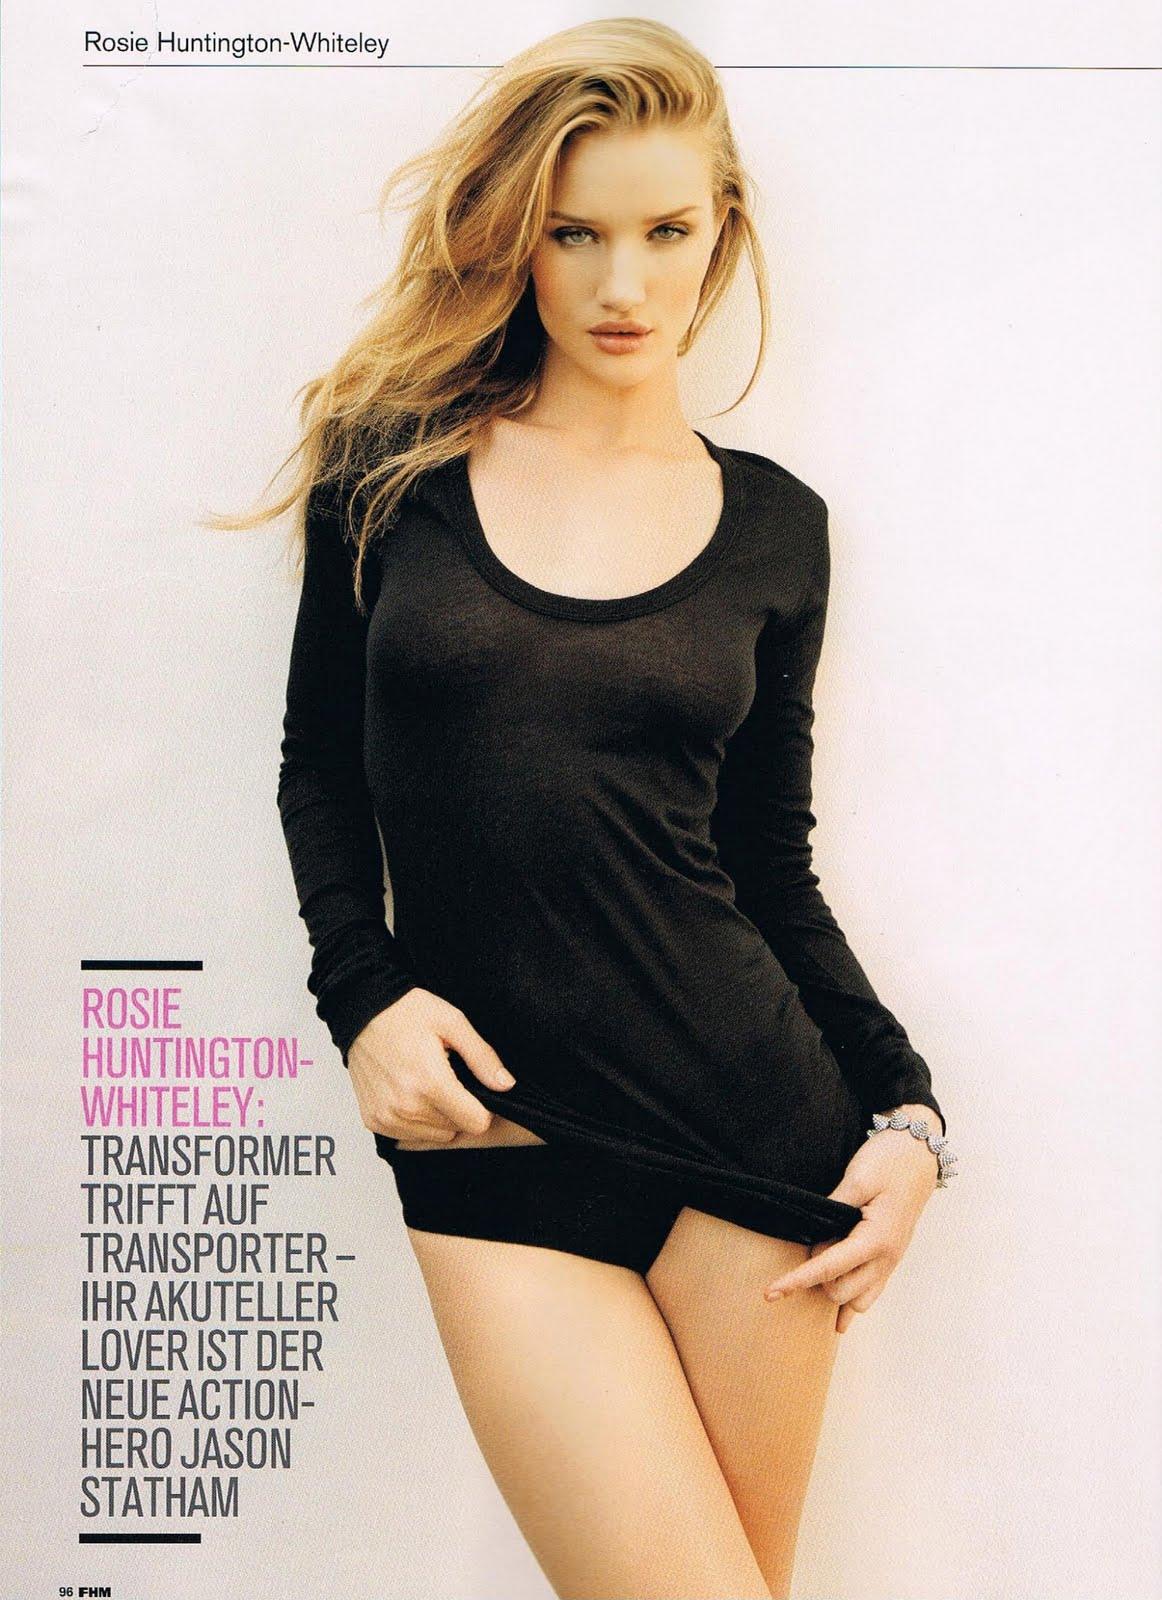 Fhm Magazine Nude Photos